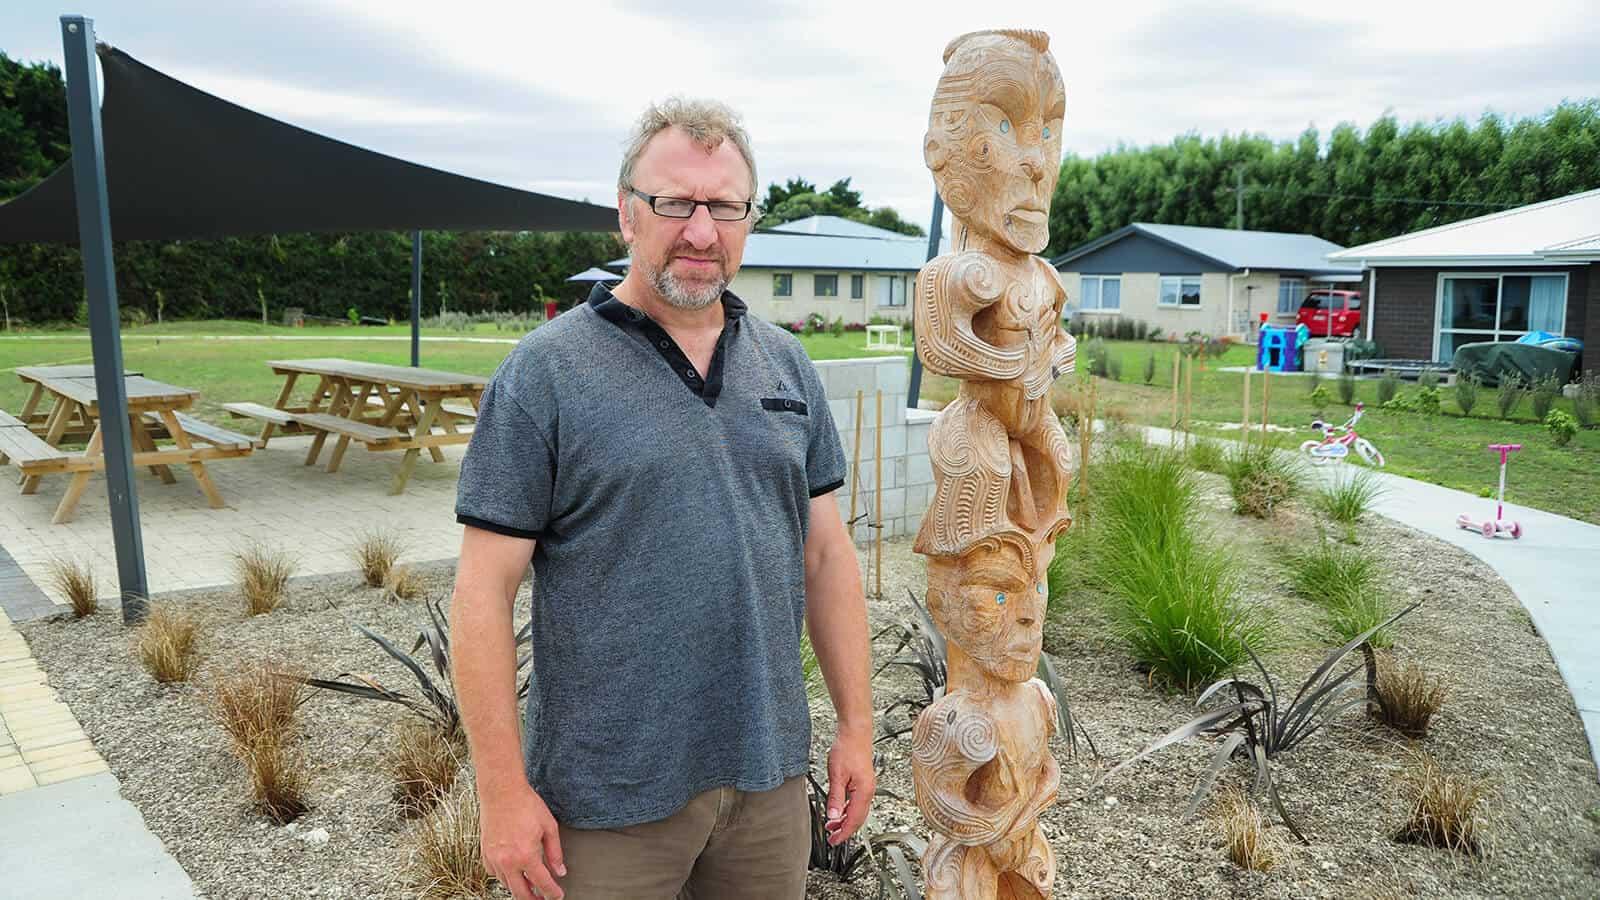 Paul Sheeran, on the Aorangi Maori Trust Board, helps whanau with Papakainga land (jointly-owned) realise their housing aspirations